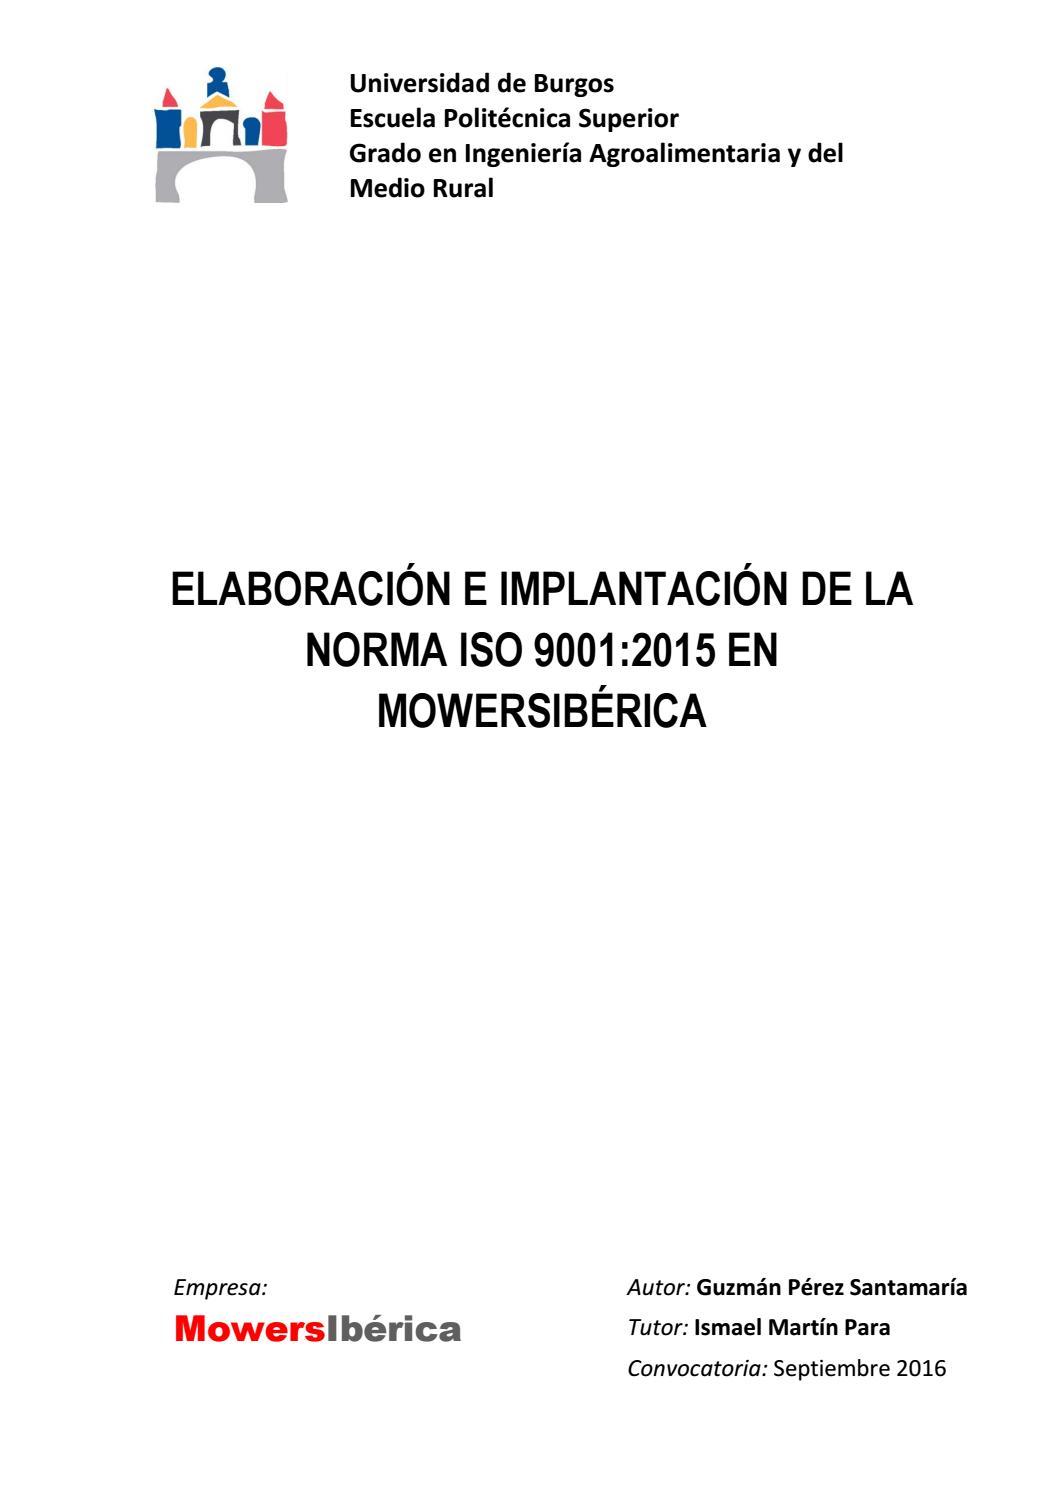 TFG ISO 9001:2015 Guzman Perez Santamaria by Guzman - issuu